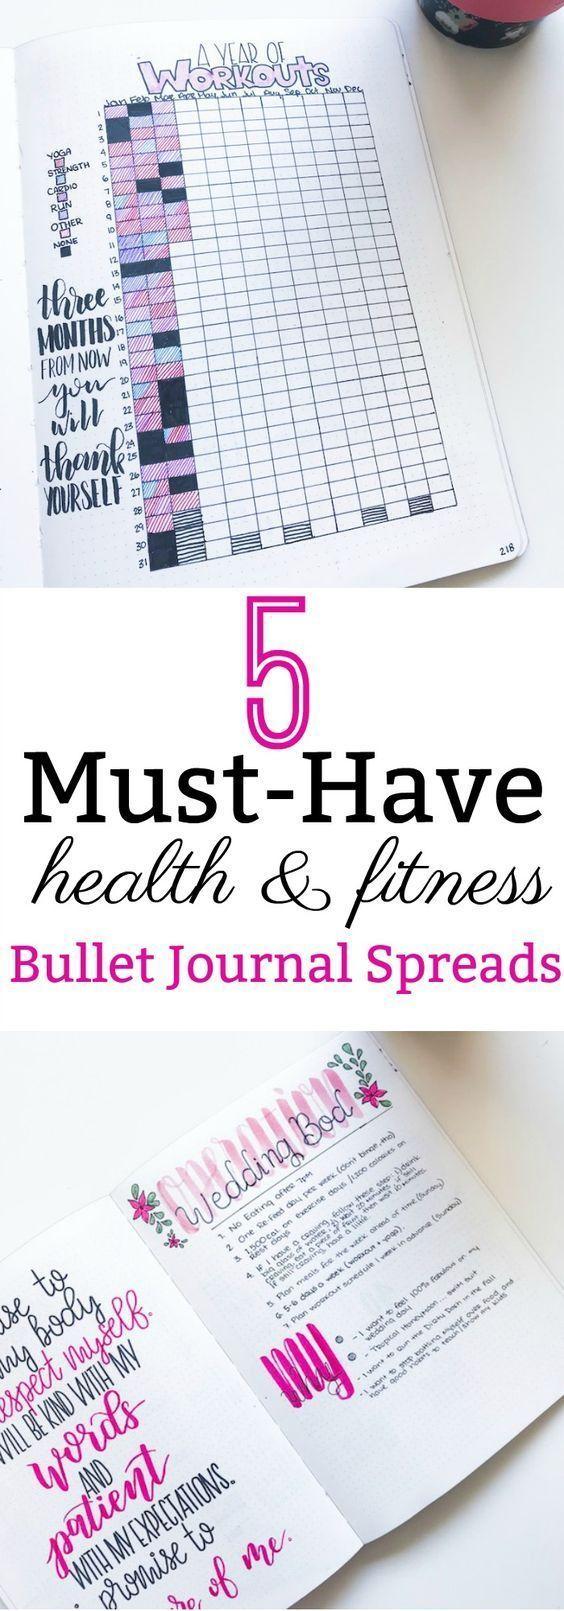 #gesundheit #gesundheit #musthave #musthave #fitness #journal #spreads #fitness #journal #spreads #j...